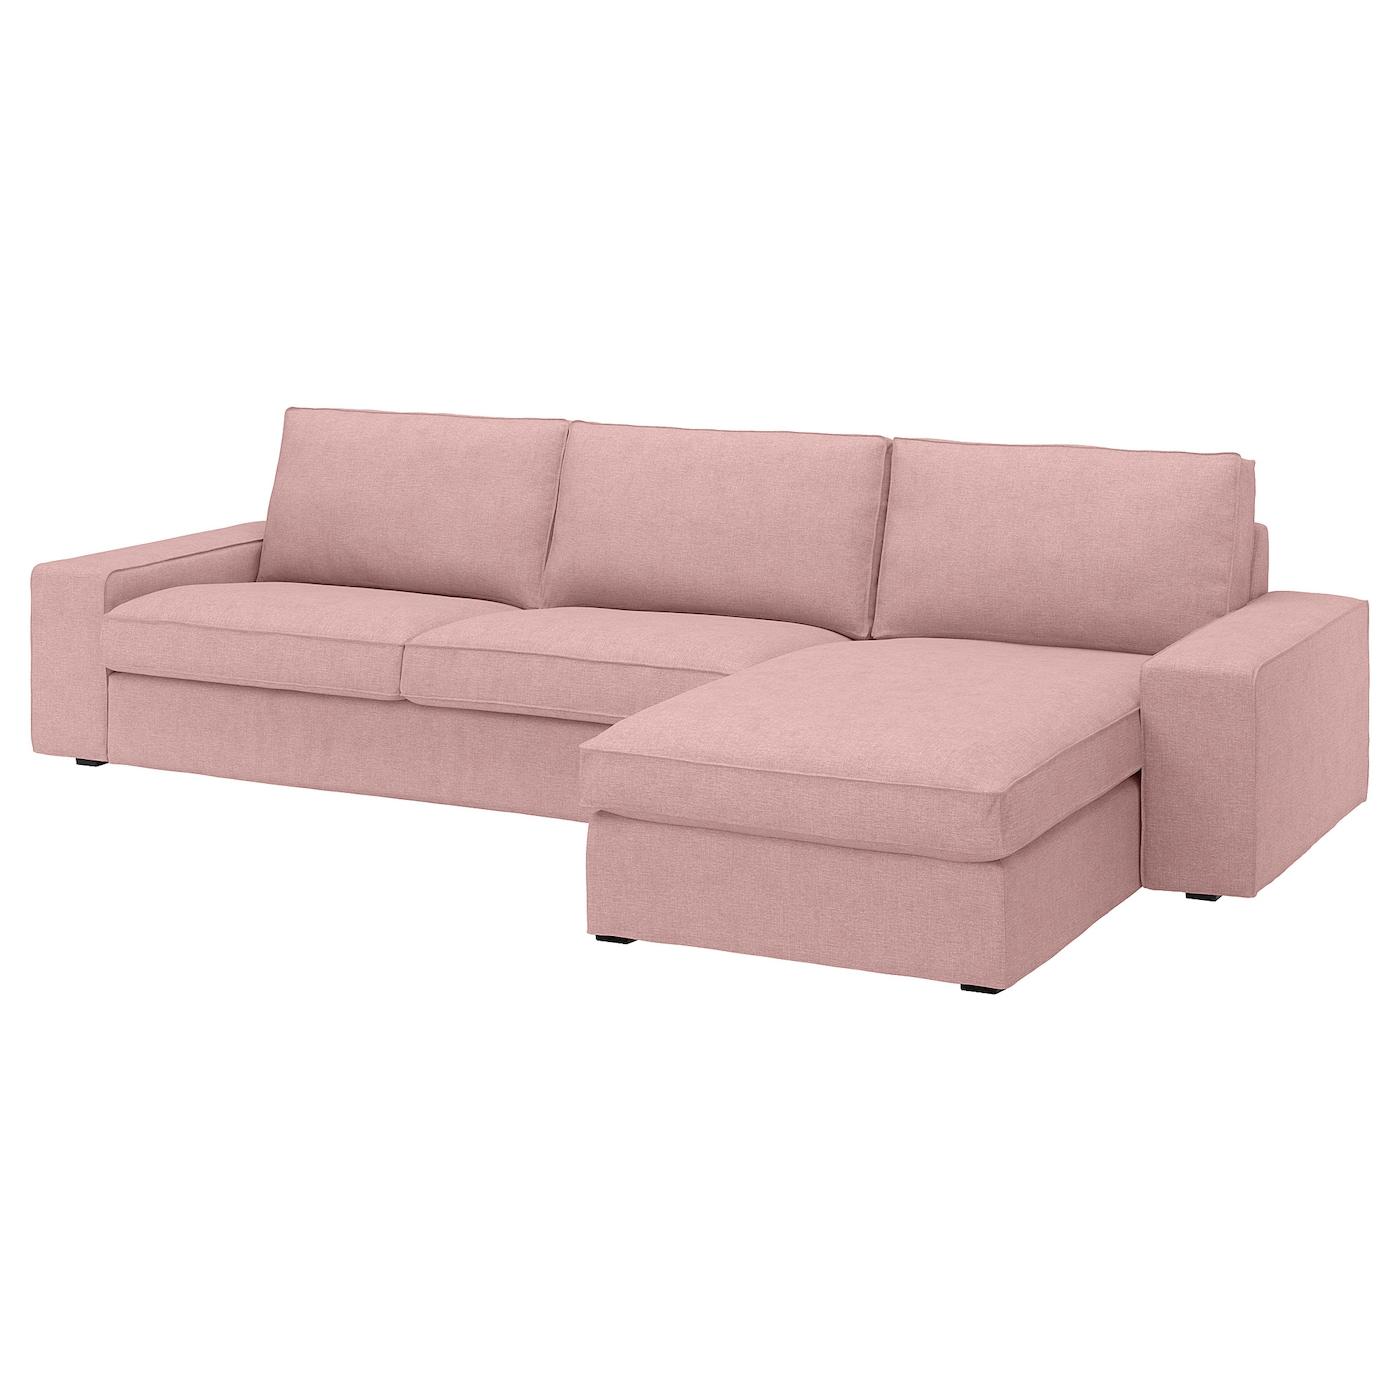 Kivik 4 Seat Sofa With Chaise Longue